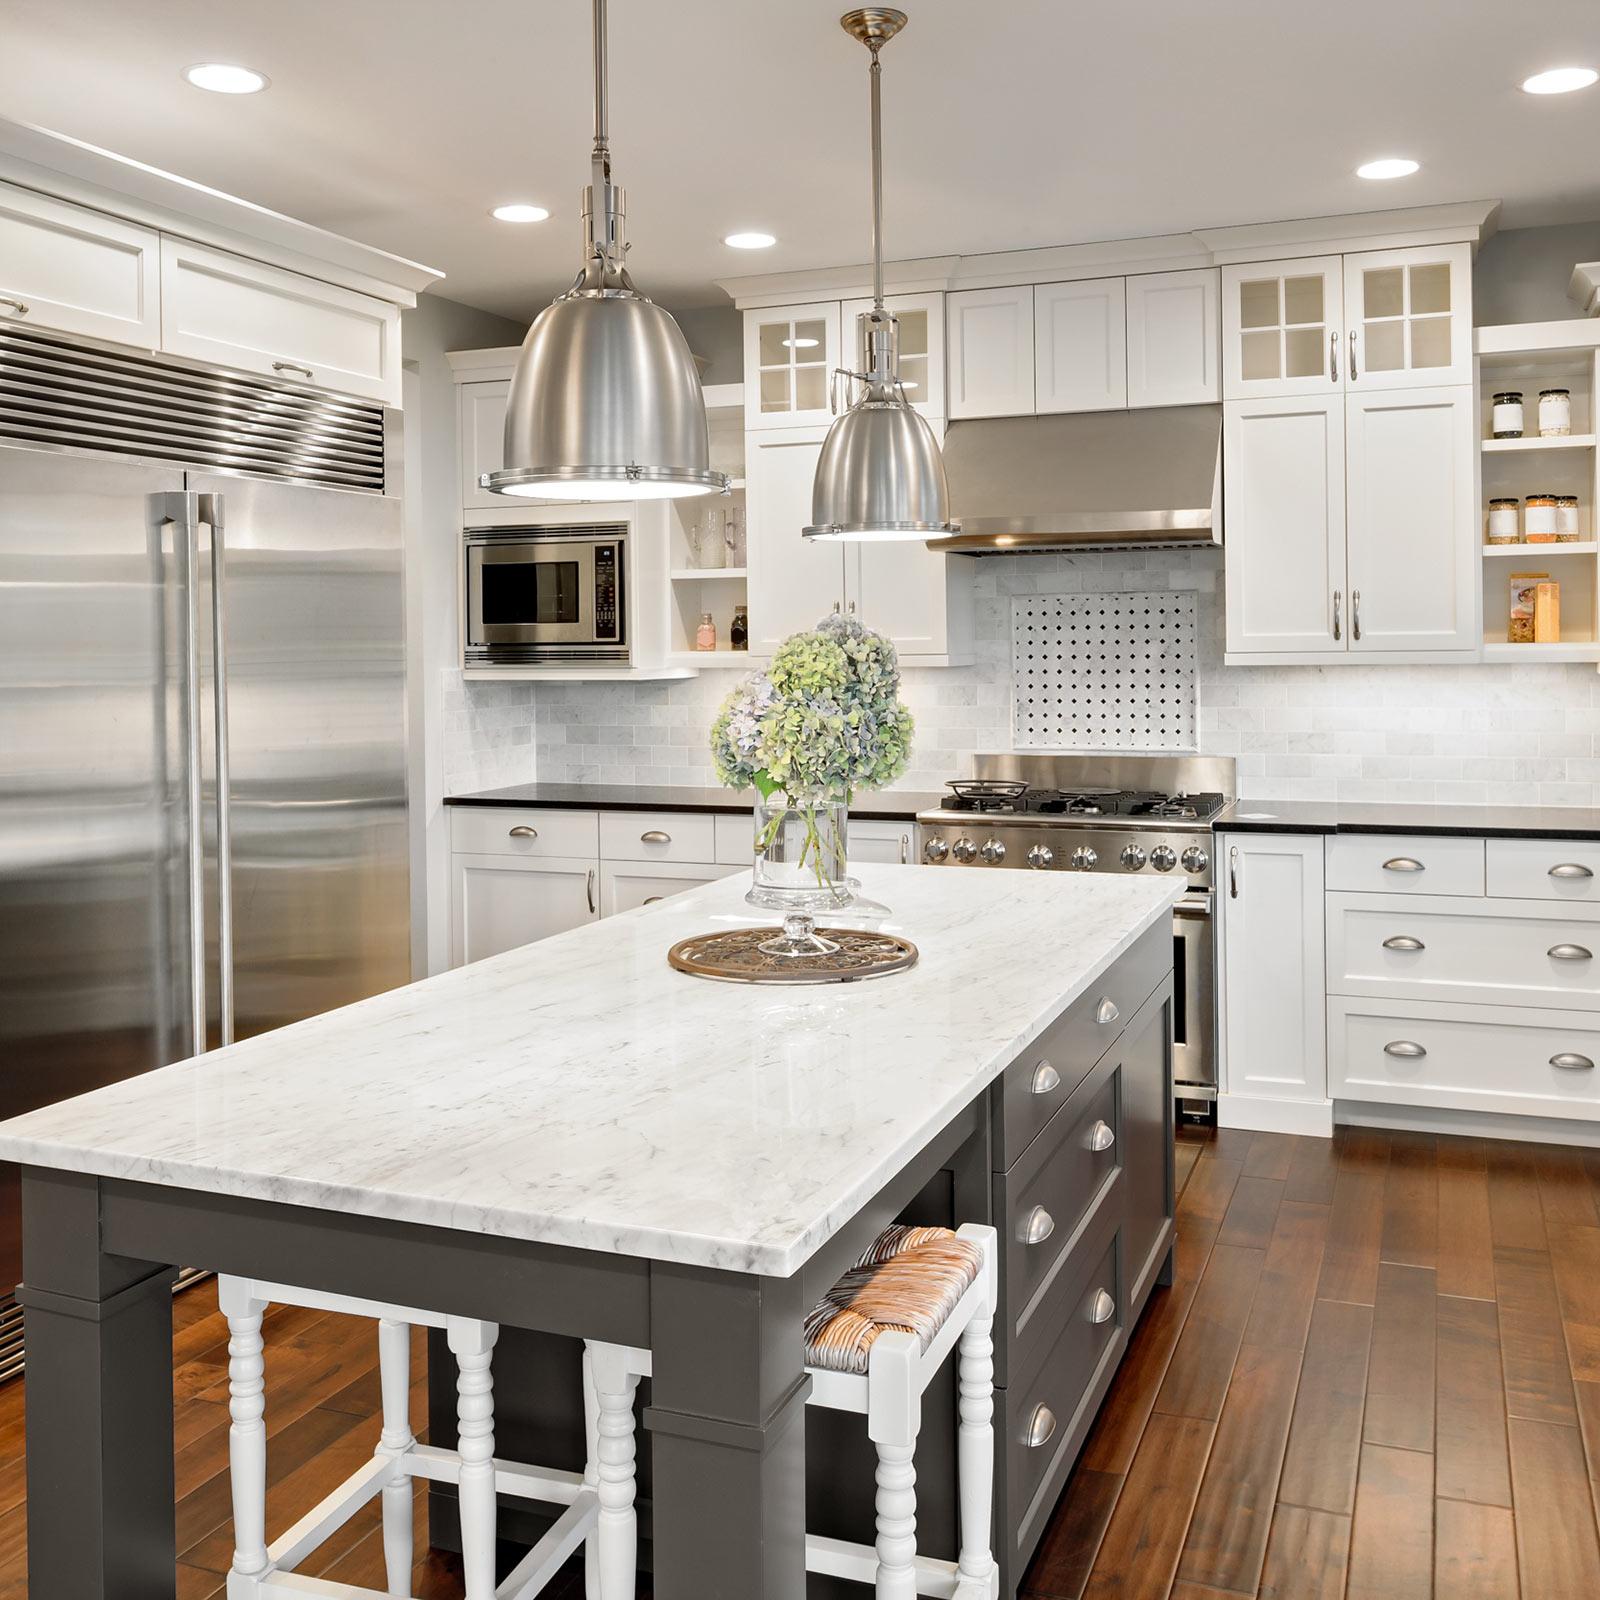 Choosing the Right Backsplash for Your Kitchen | Staff Carpet